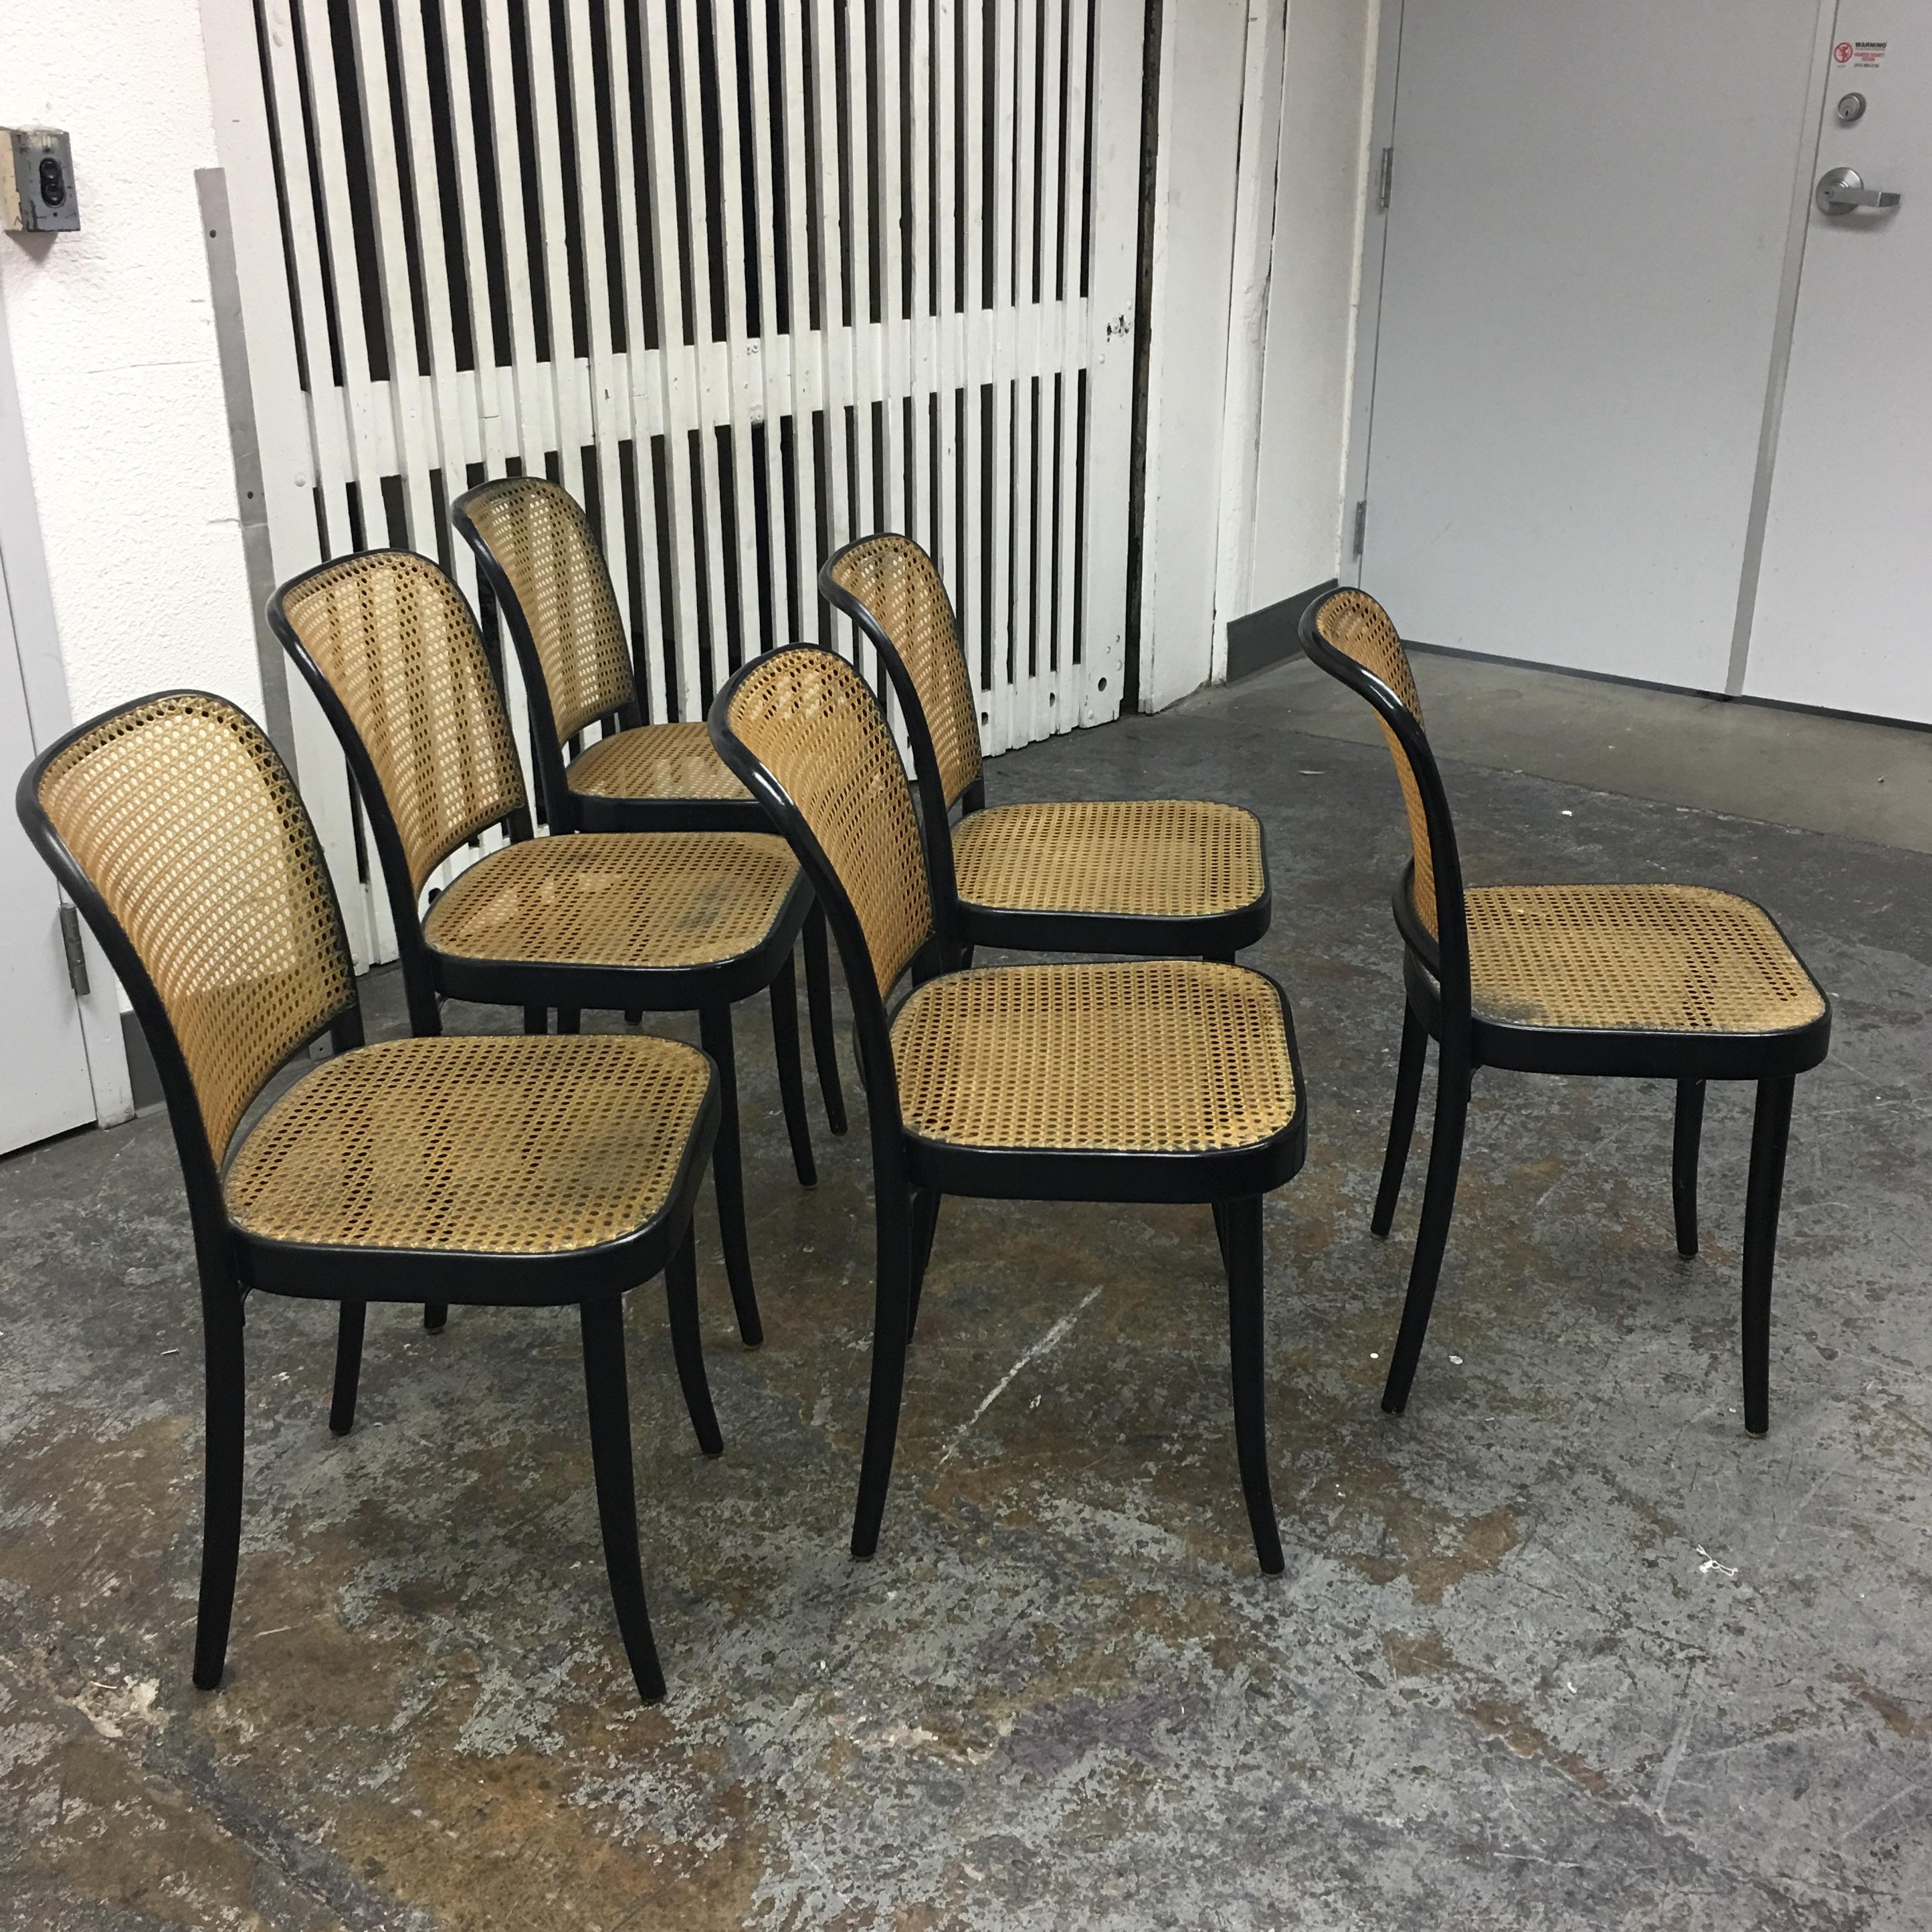 Delightful Stendig Thonet Black Bentwood Prague Dining Chairs   Set Of 6   Image 5 Of 9